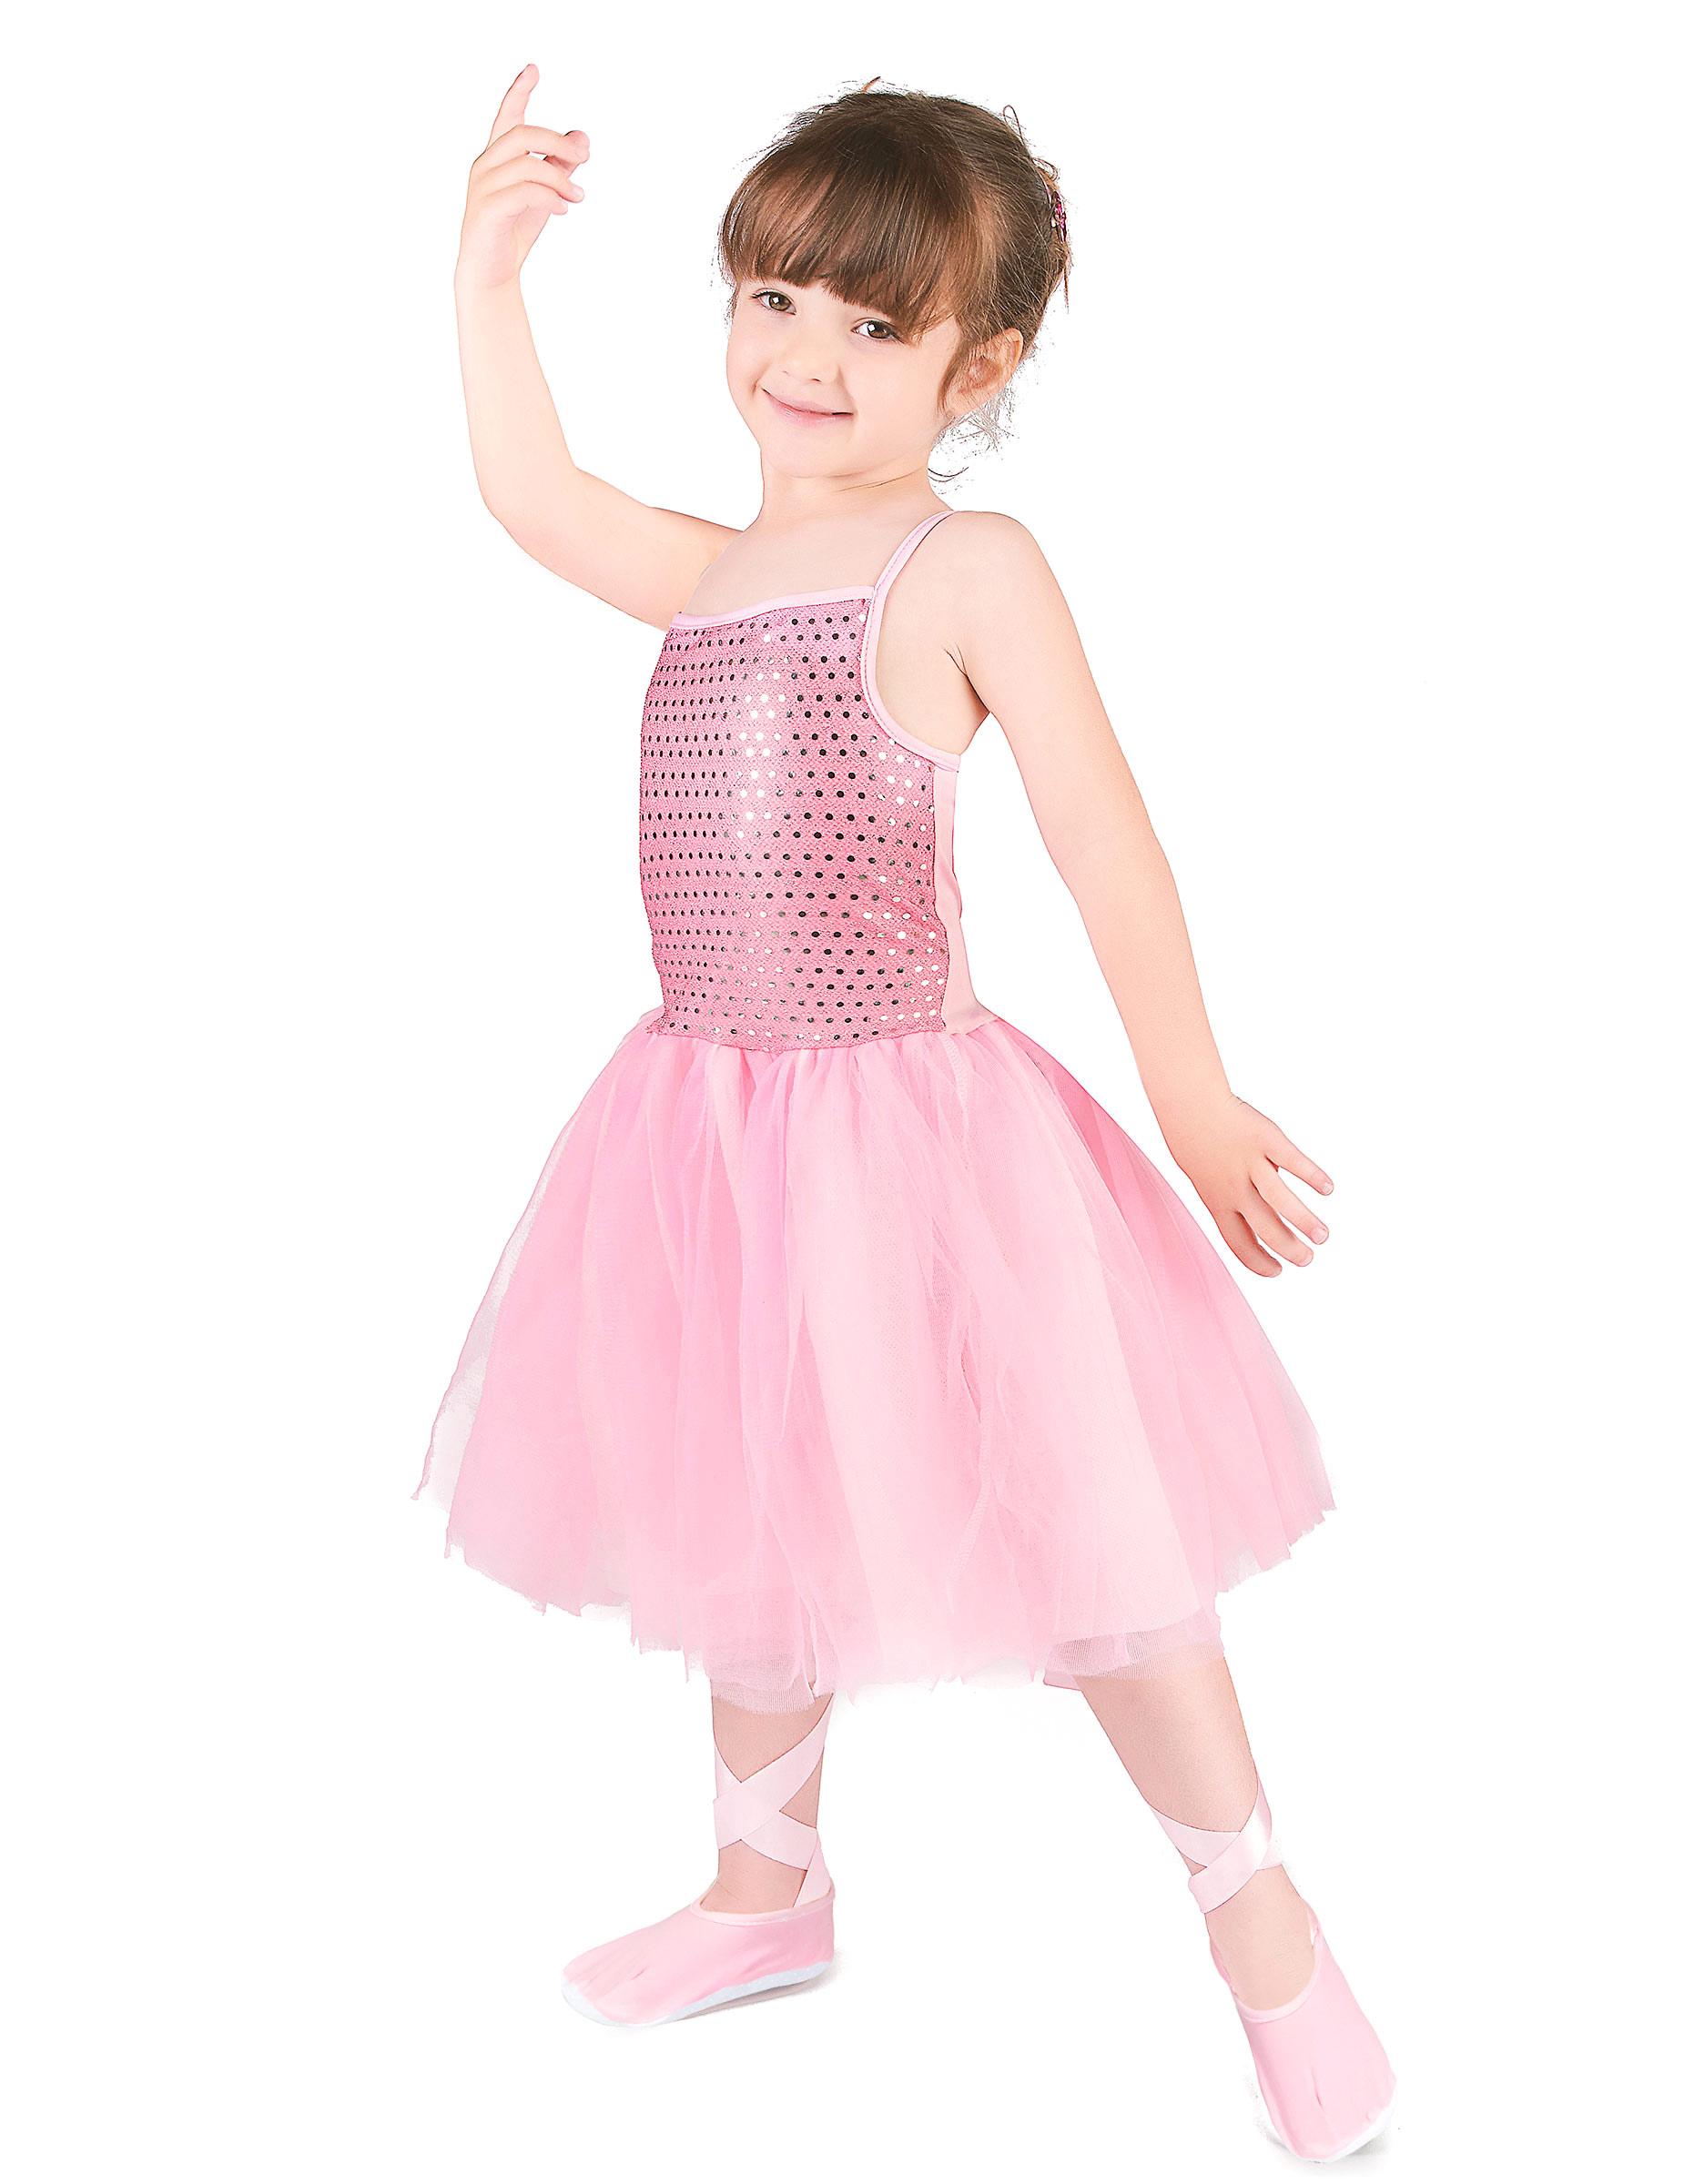 ballerina kost m f r kinder mit pailletten t nzerin rosa g nstige faschings kost me bei. Black Bedroom Furniture Sets. Home Design Ideas